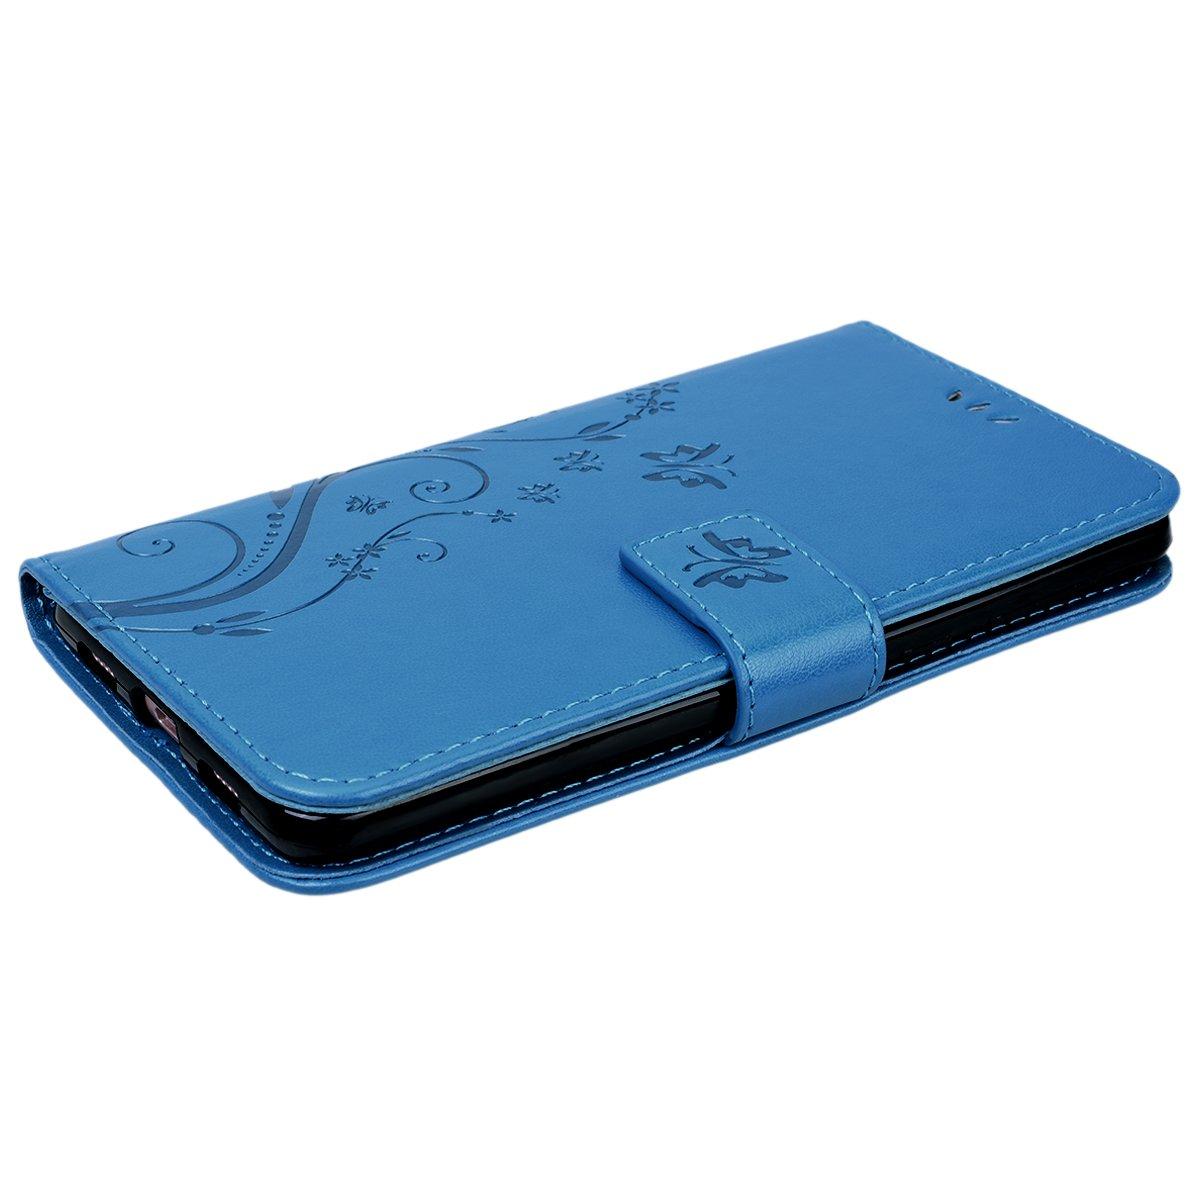 Gold VemMore Huawei Honor 6X H/ülle Handyh/ülle Schutzh/ülle Leder PU Wallet Flip Case Bumper Lederh/ülle Ledercase Schmetterling Blumen Muster Klapph/ülle Ultra Slim D/ünn Klappbar Magnetisch Backcover